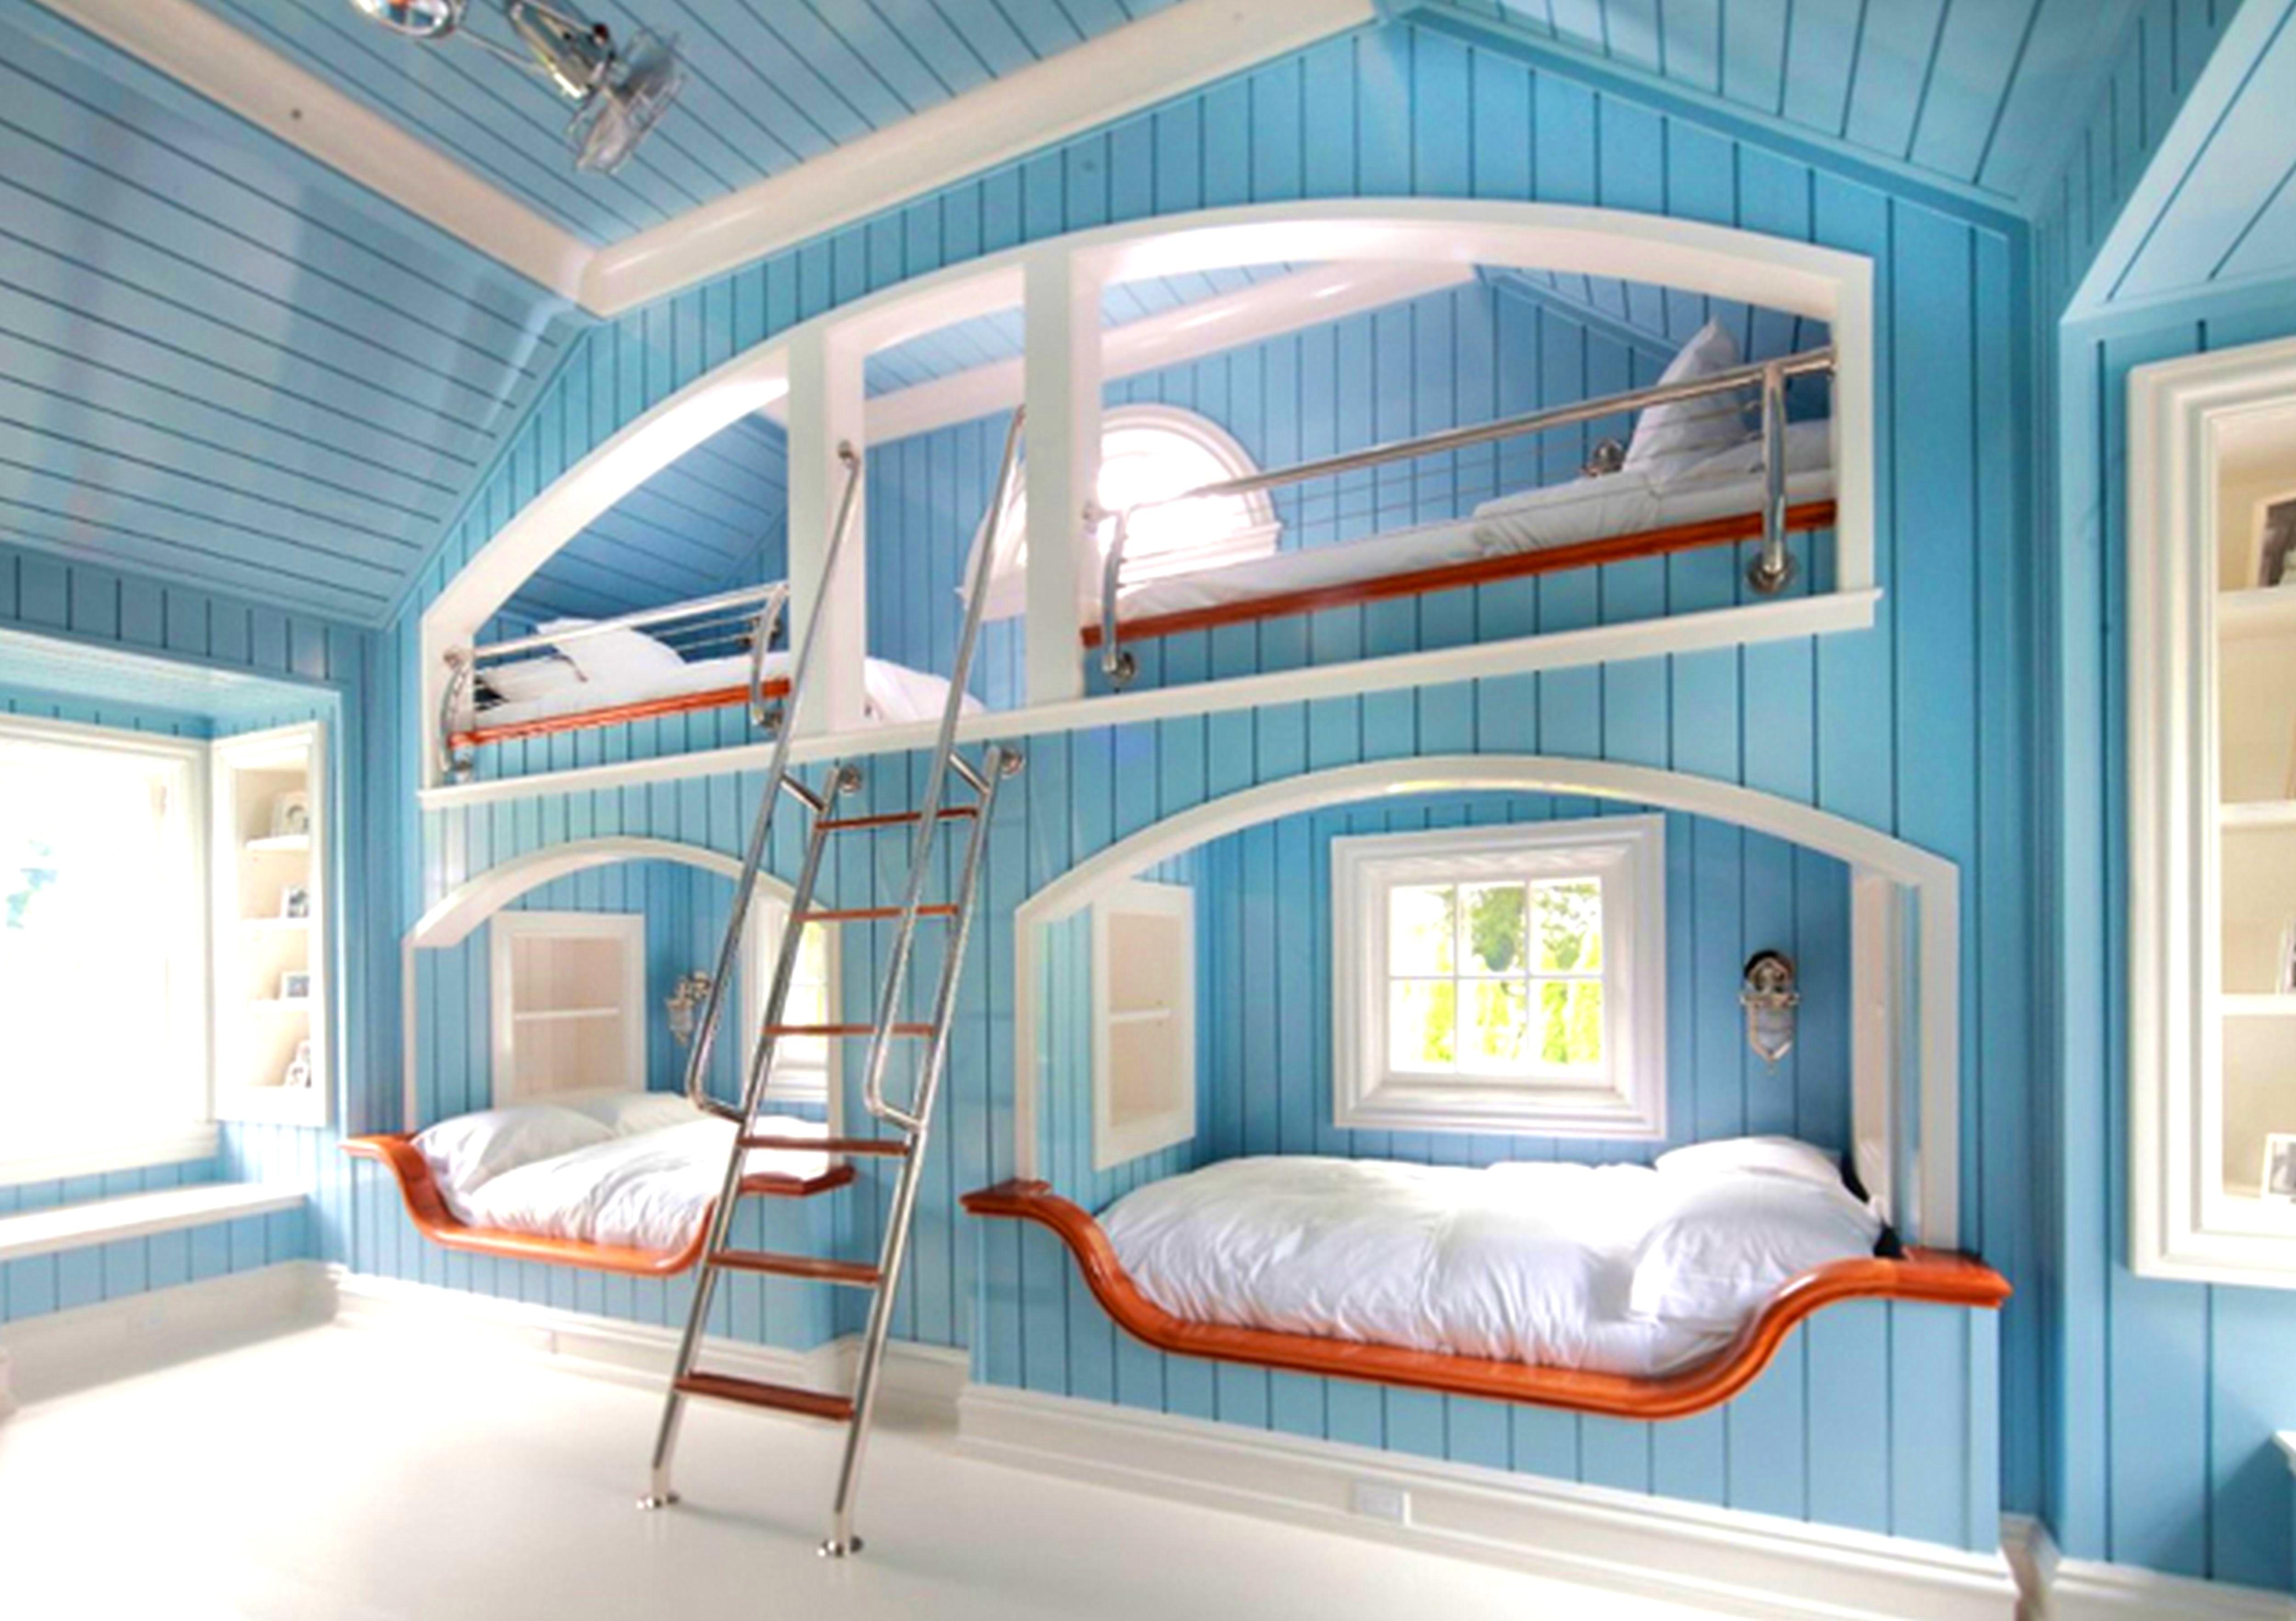 Big Rooms With Bunk Beds 5000x3531 Wallpaper Teahub Io